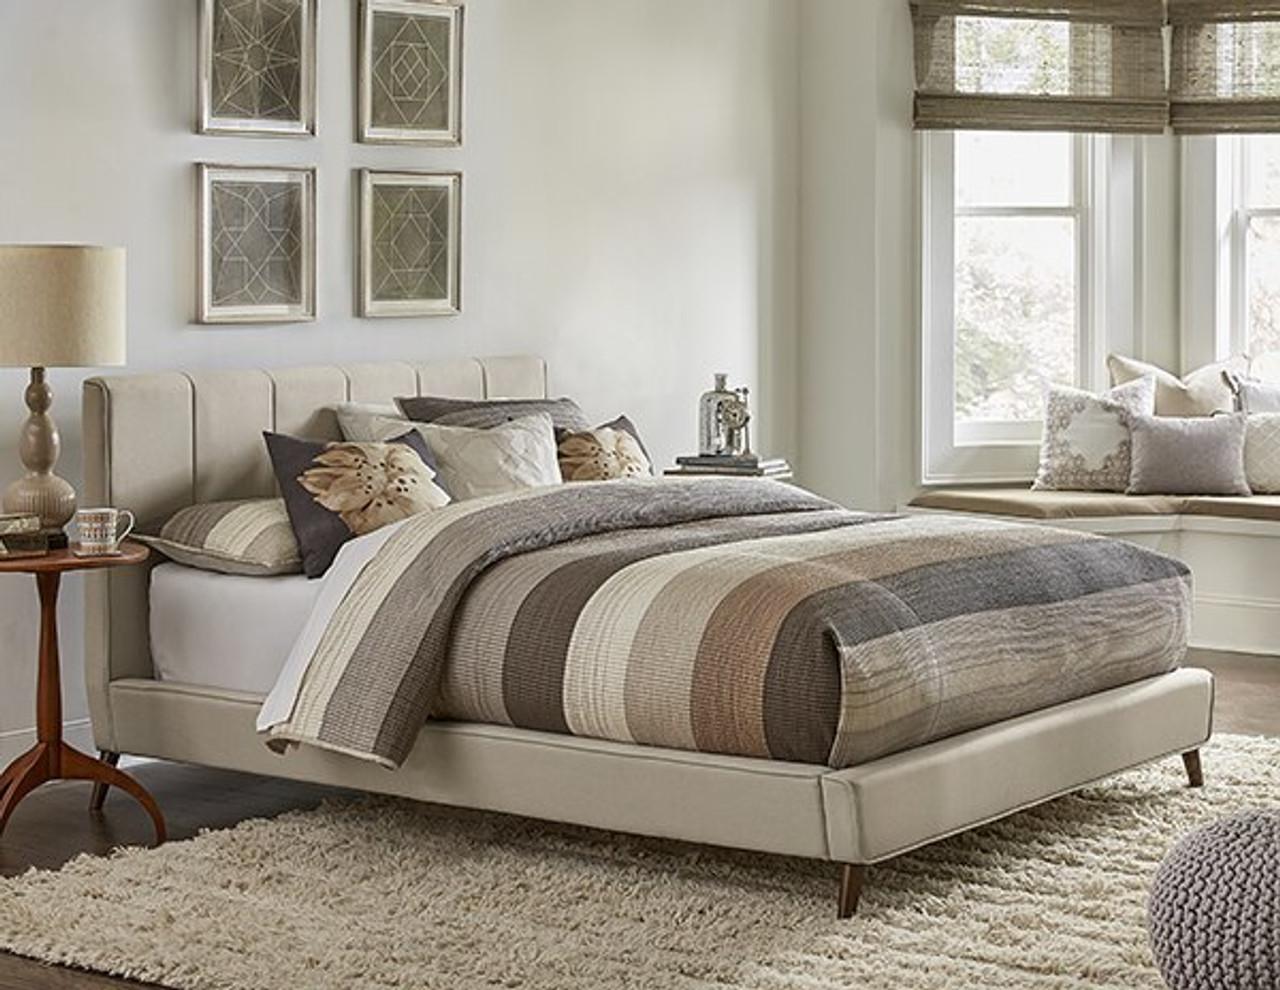 King Beds Upholstered